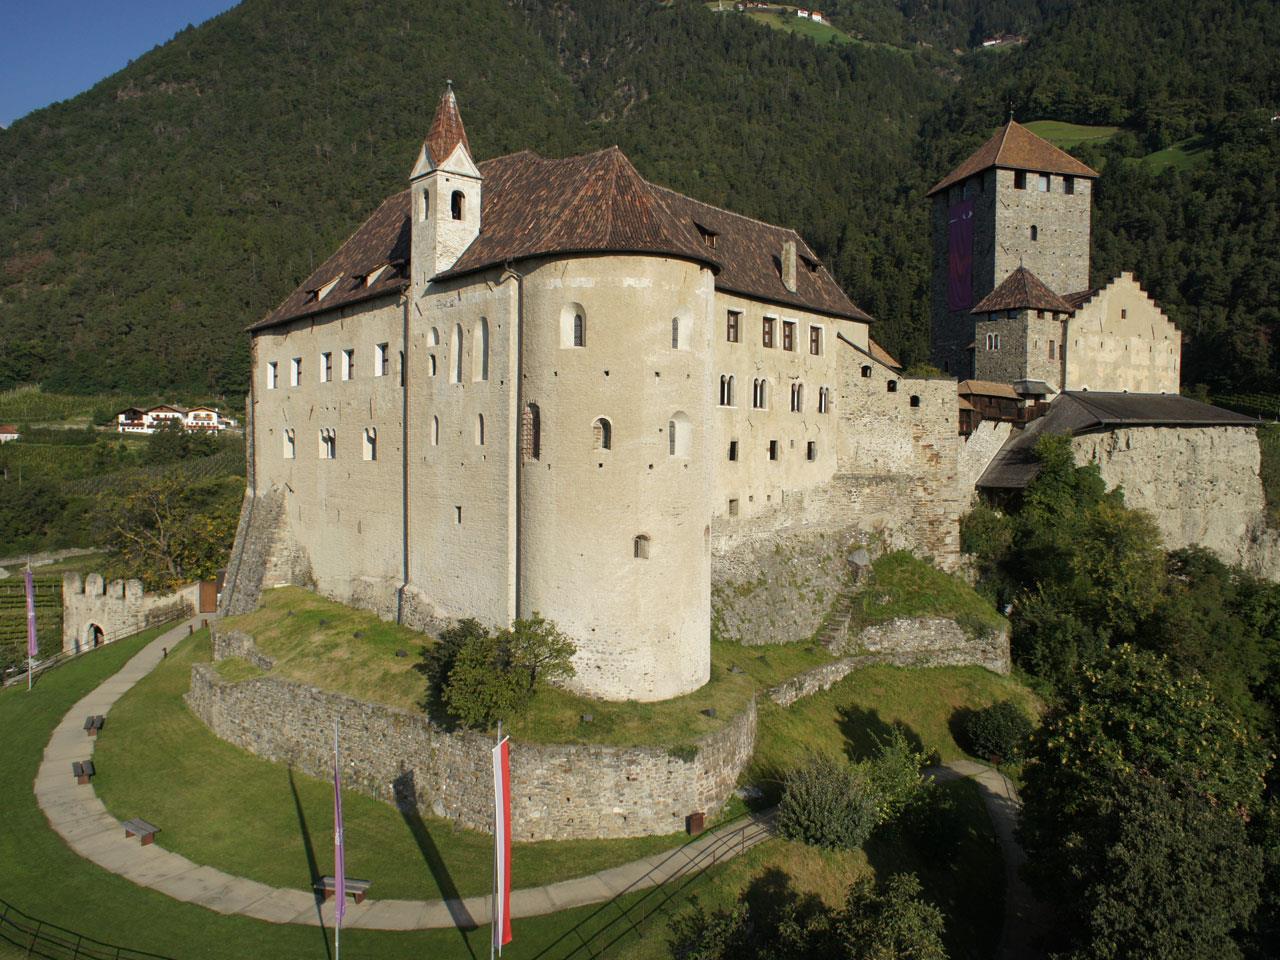 Tourismusverein Dorf Tirol/Ebner Visual